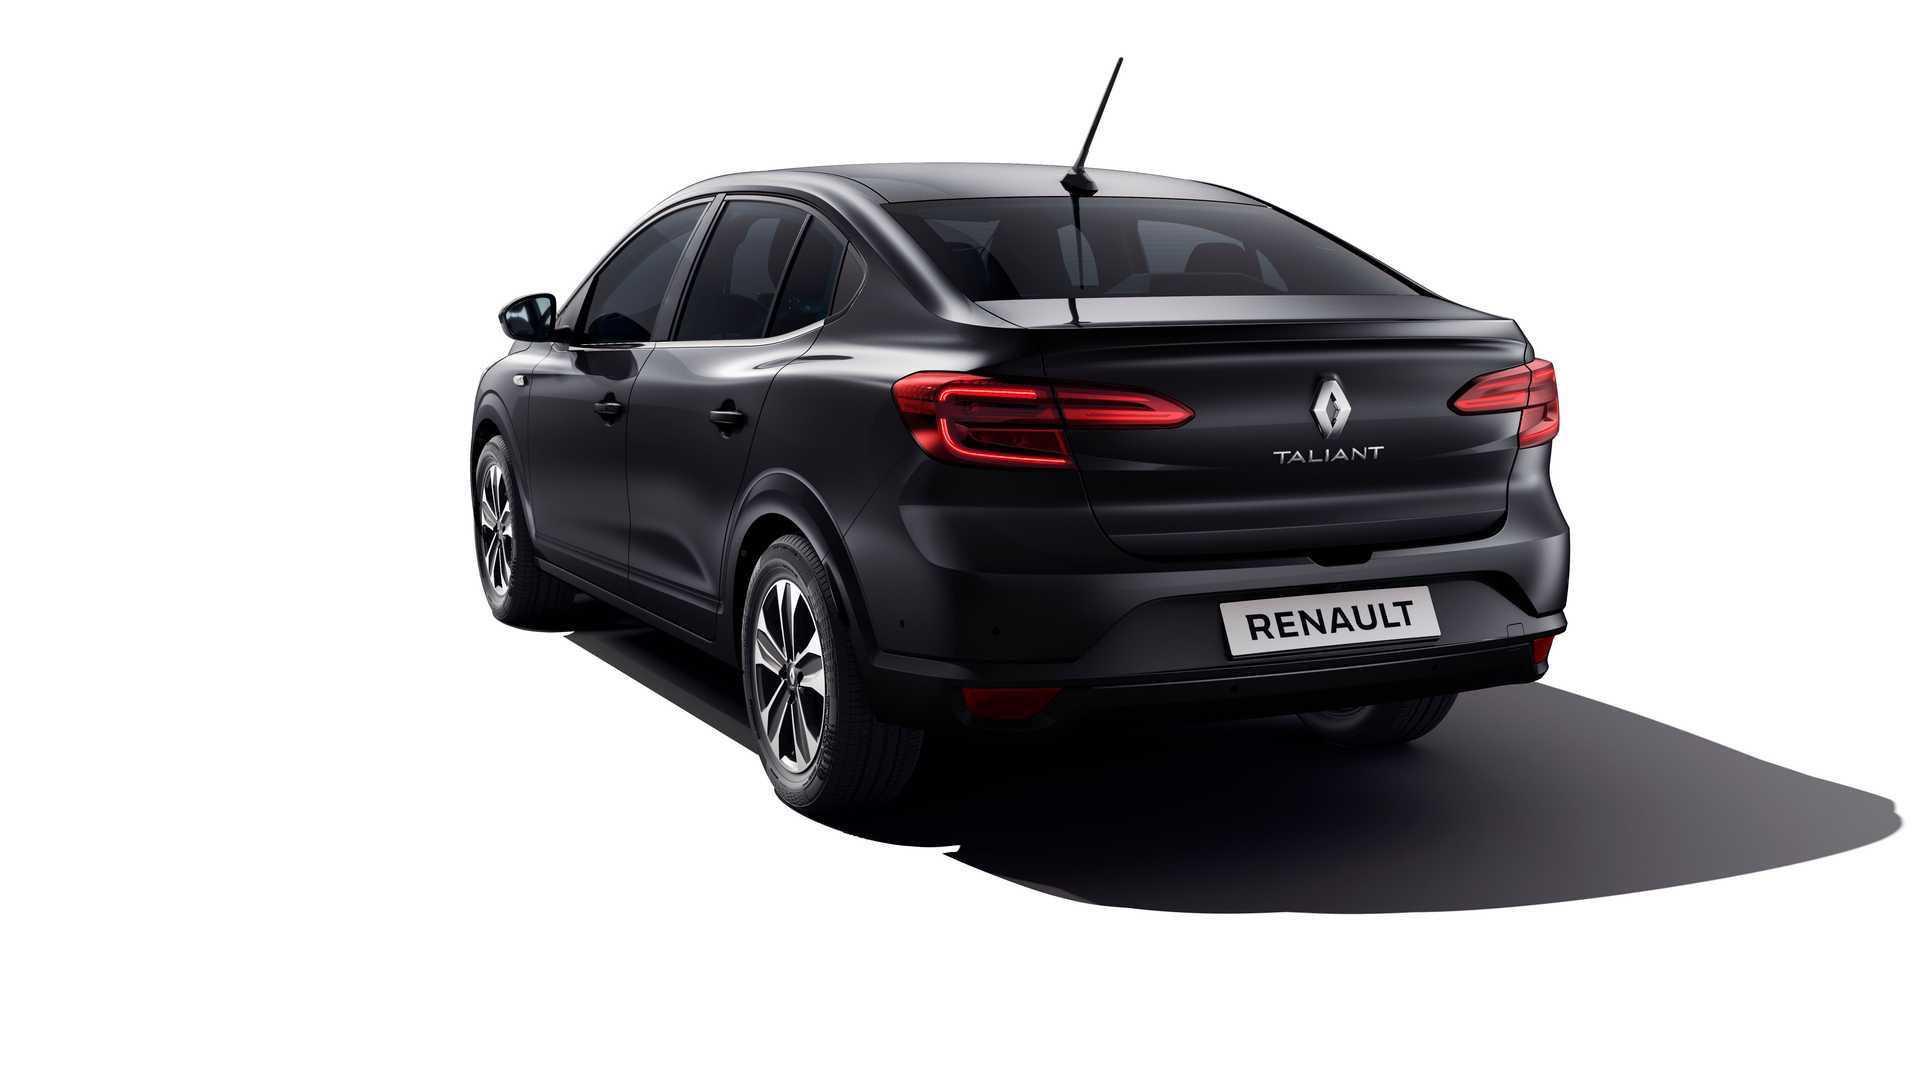 2021_Renault_Taliant-0009